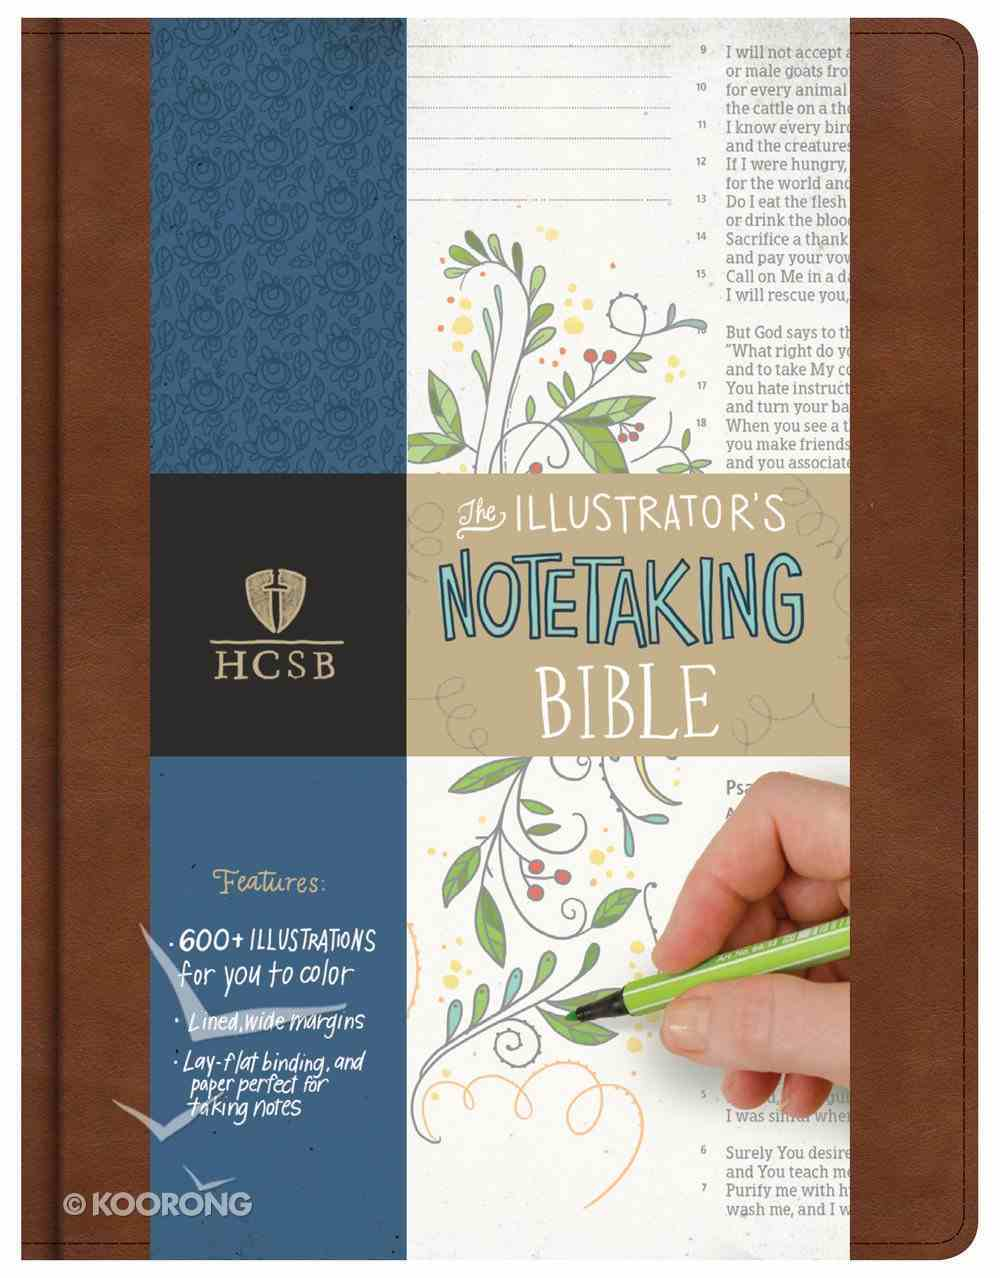 HCSB Illustrator's Notetaking Bible British Tan Bonded Leather